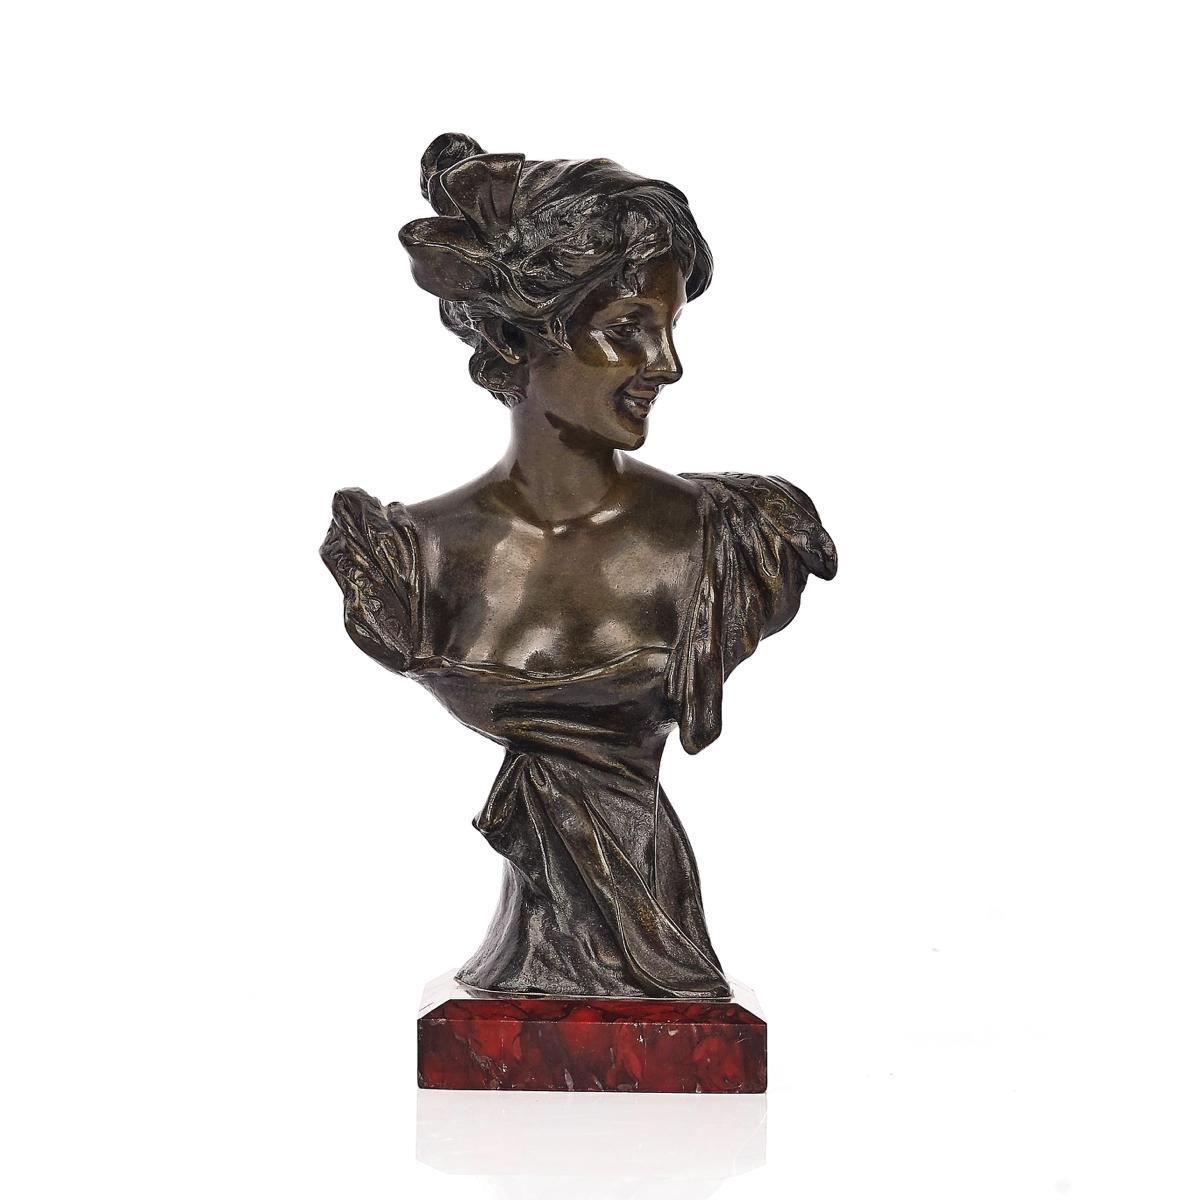 A BRONZE BUST OF AN ART NOUVEAU LADY